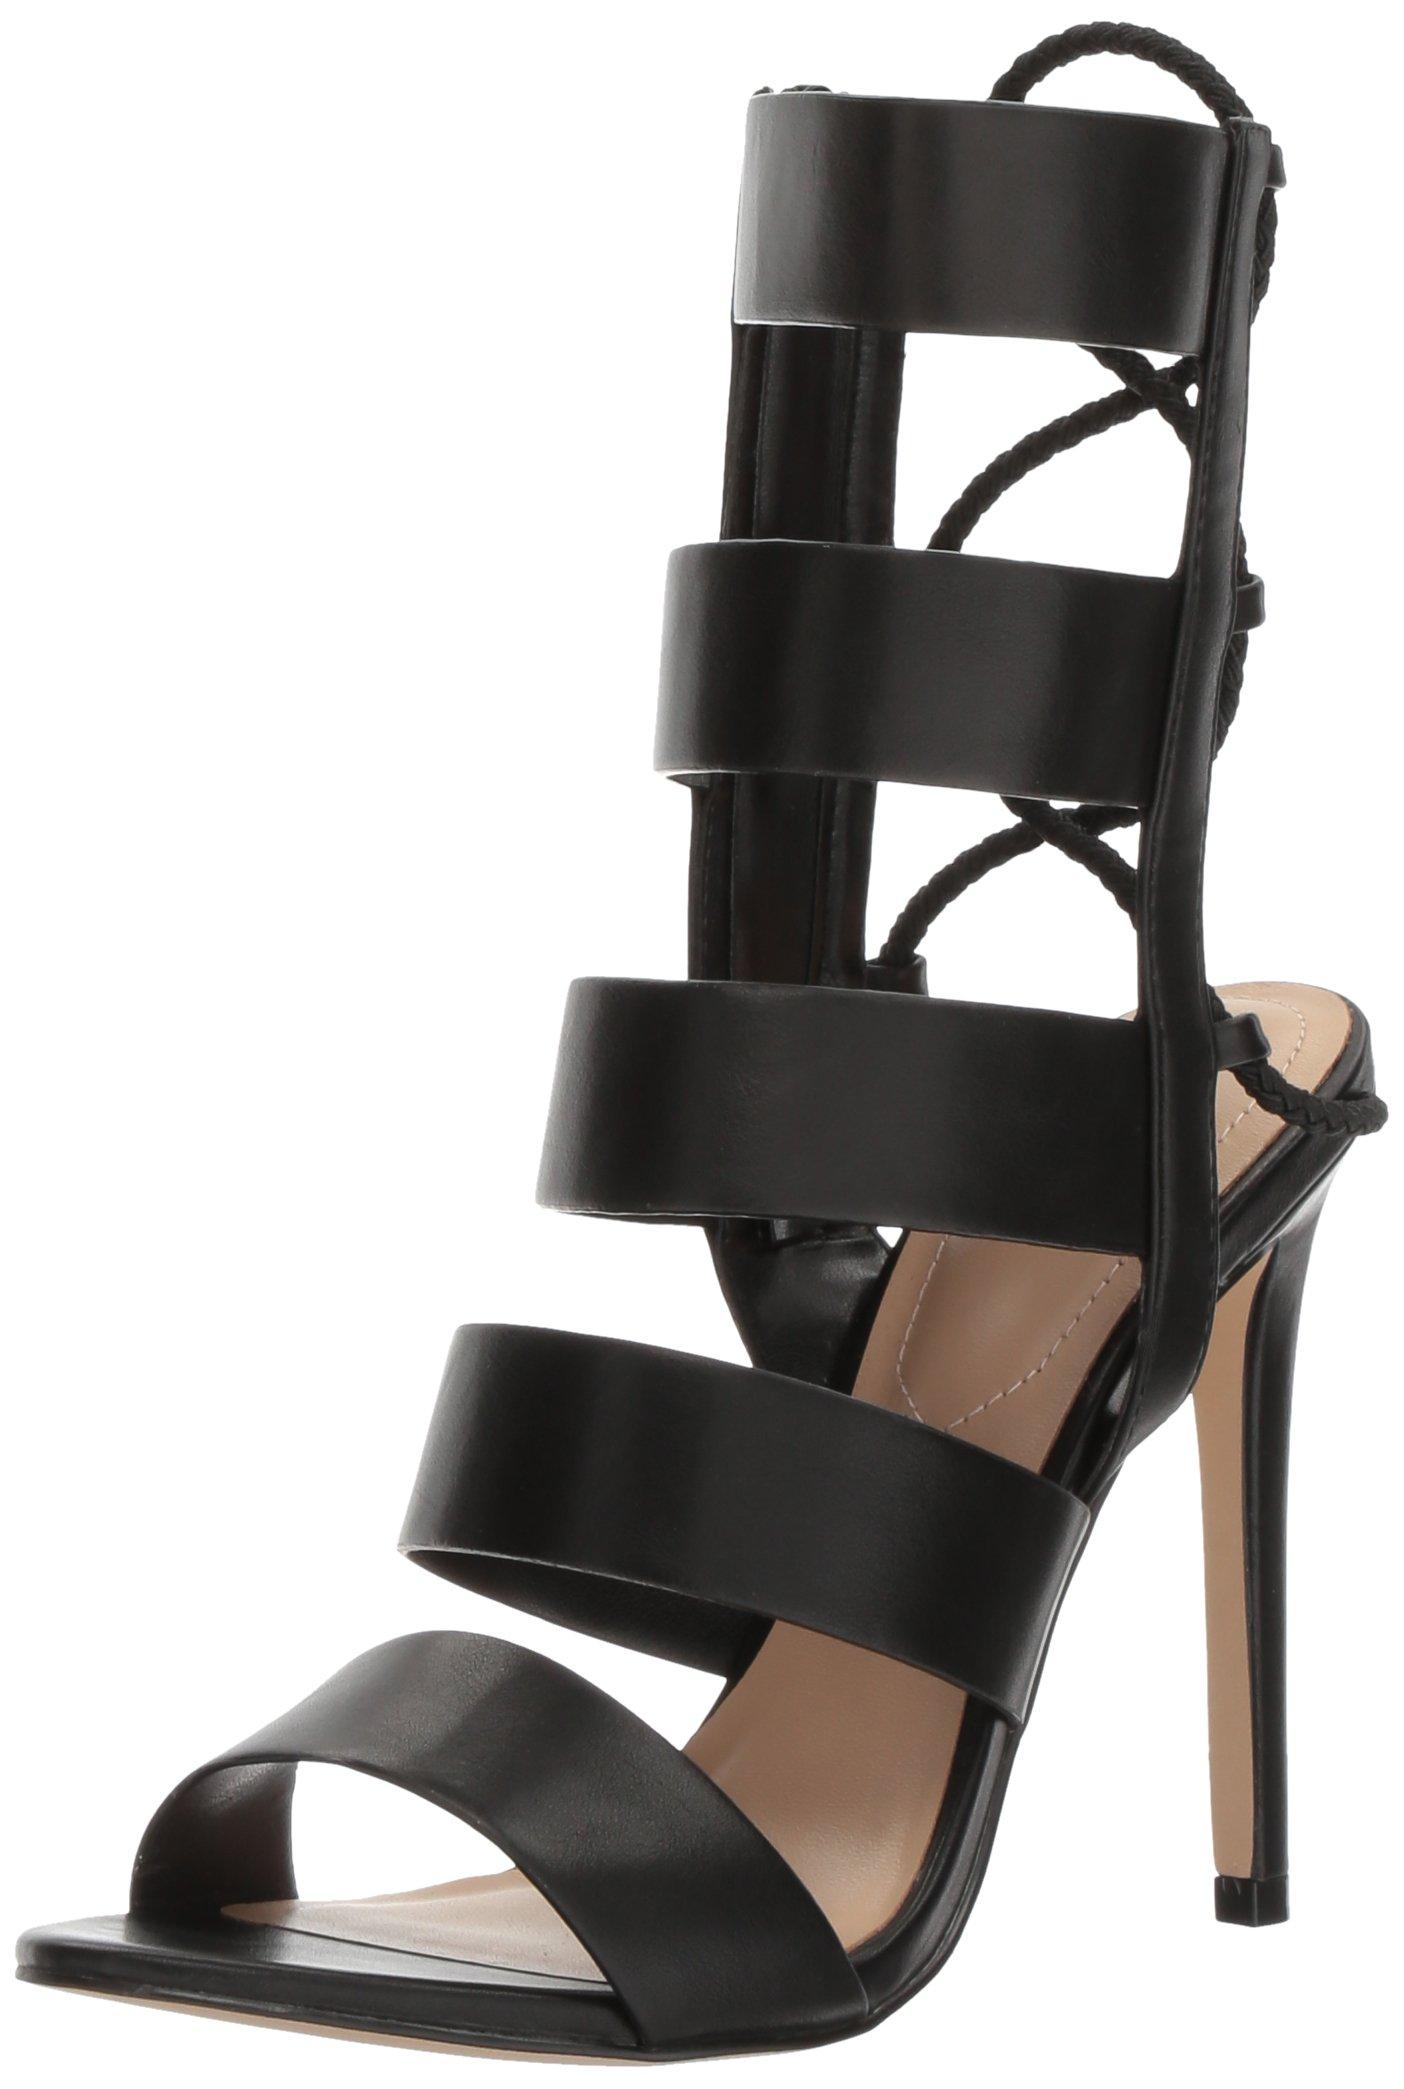 ویکالا · خرید  اصل اورجینال · خرید از آمازون · ALDO Women's Hawaii Gladiator Sandal, Black Synthetic, 8 B US wekala · ویکالا